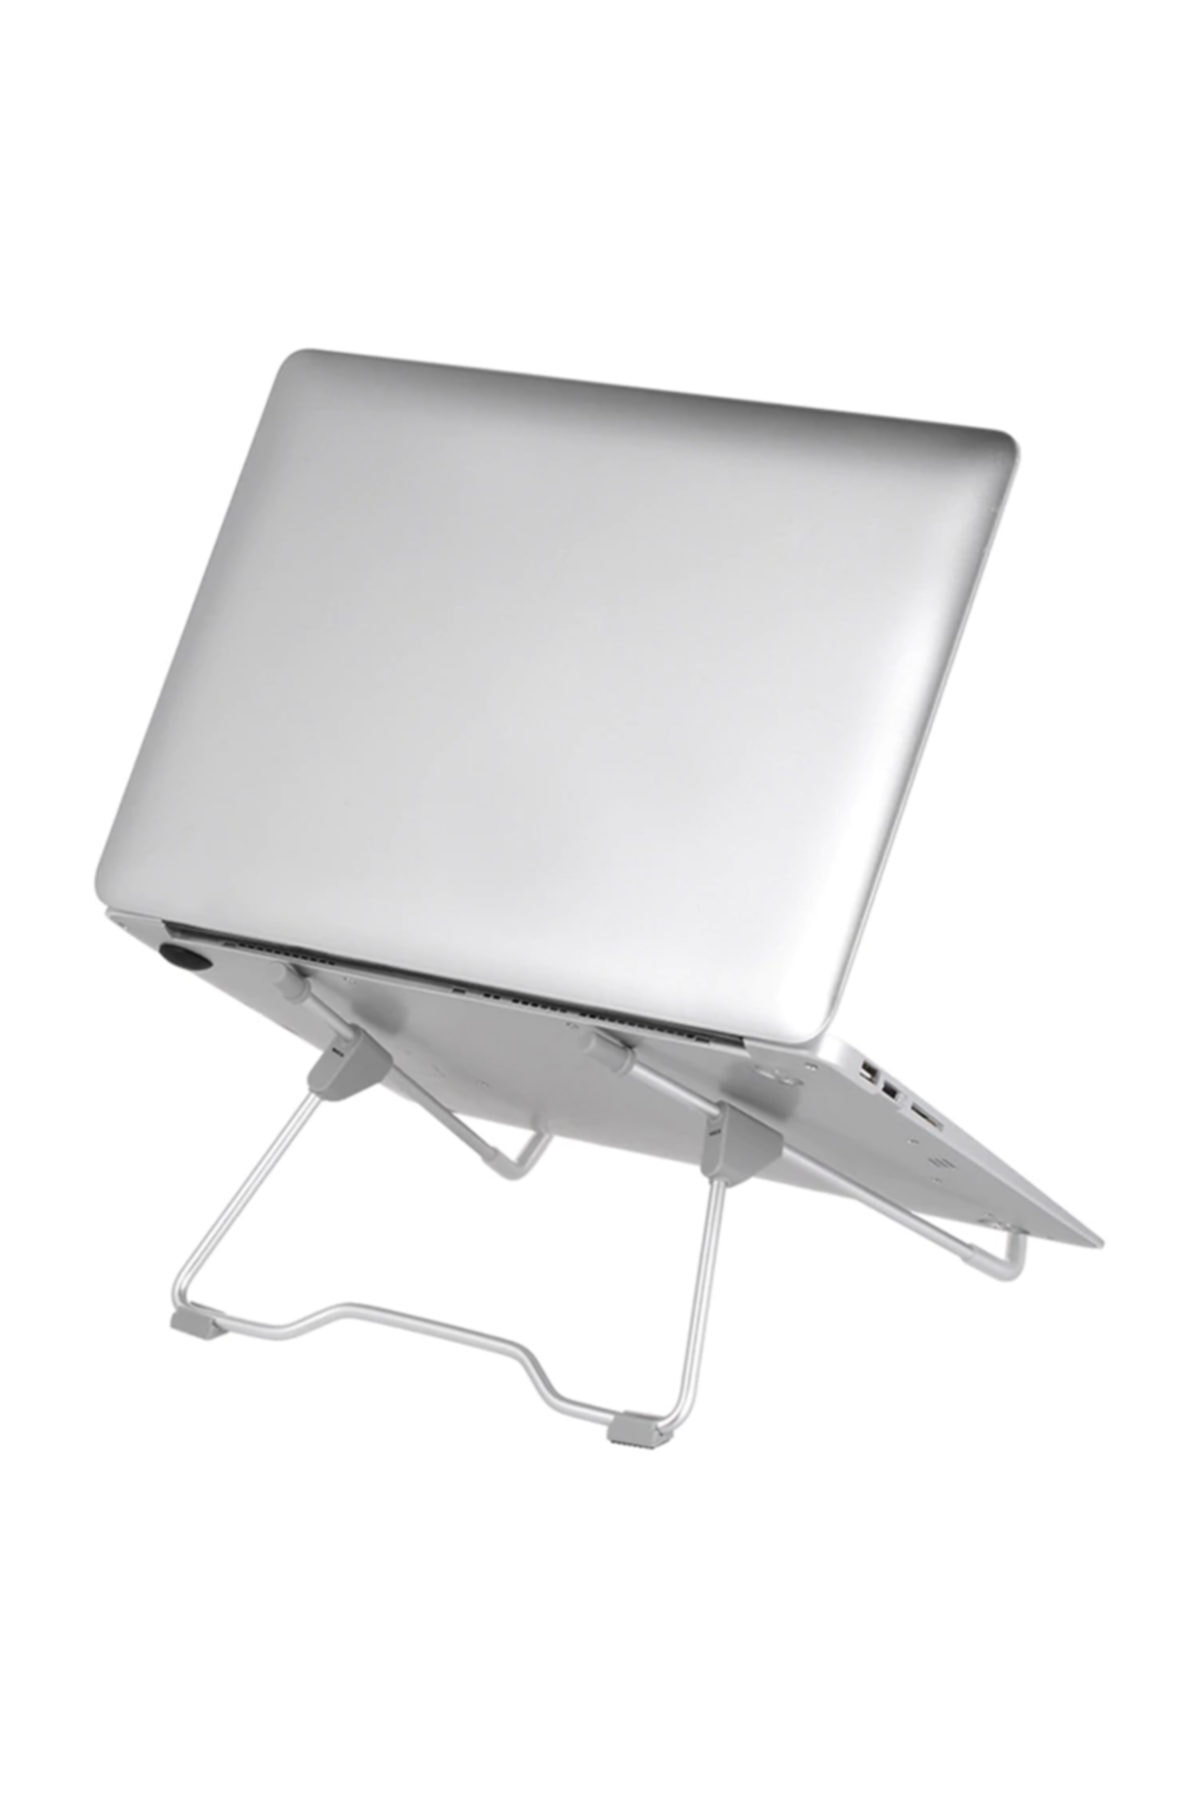 Weather Forecast Alüminyum Ayarlı Laptop Tablet Notebook Yükseltici Tutucu 1